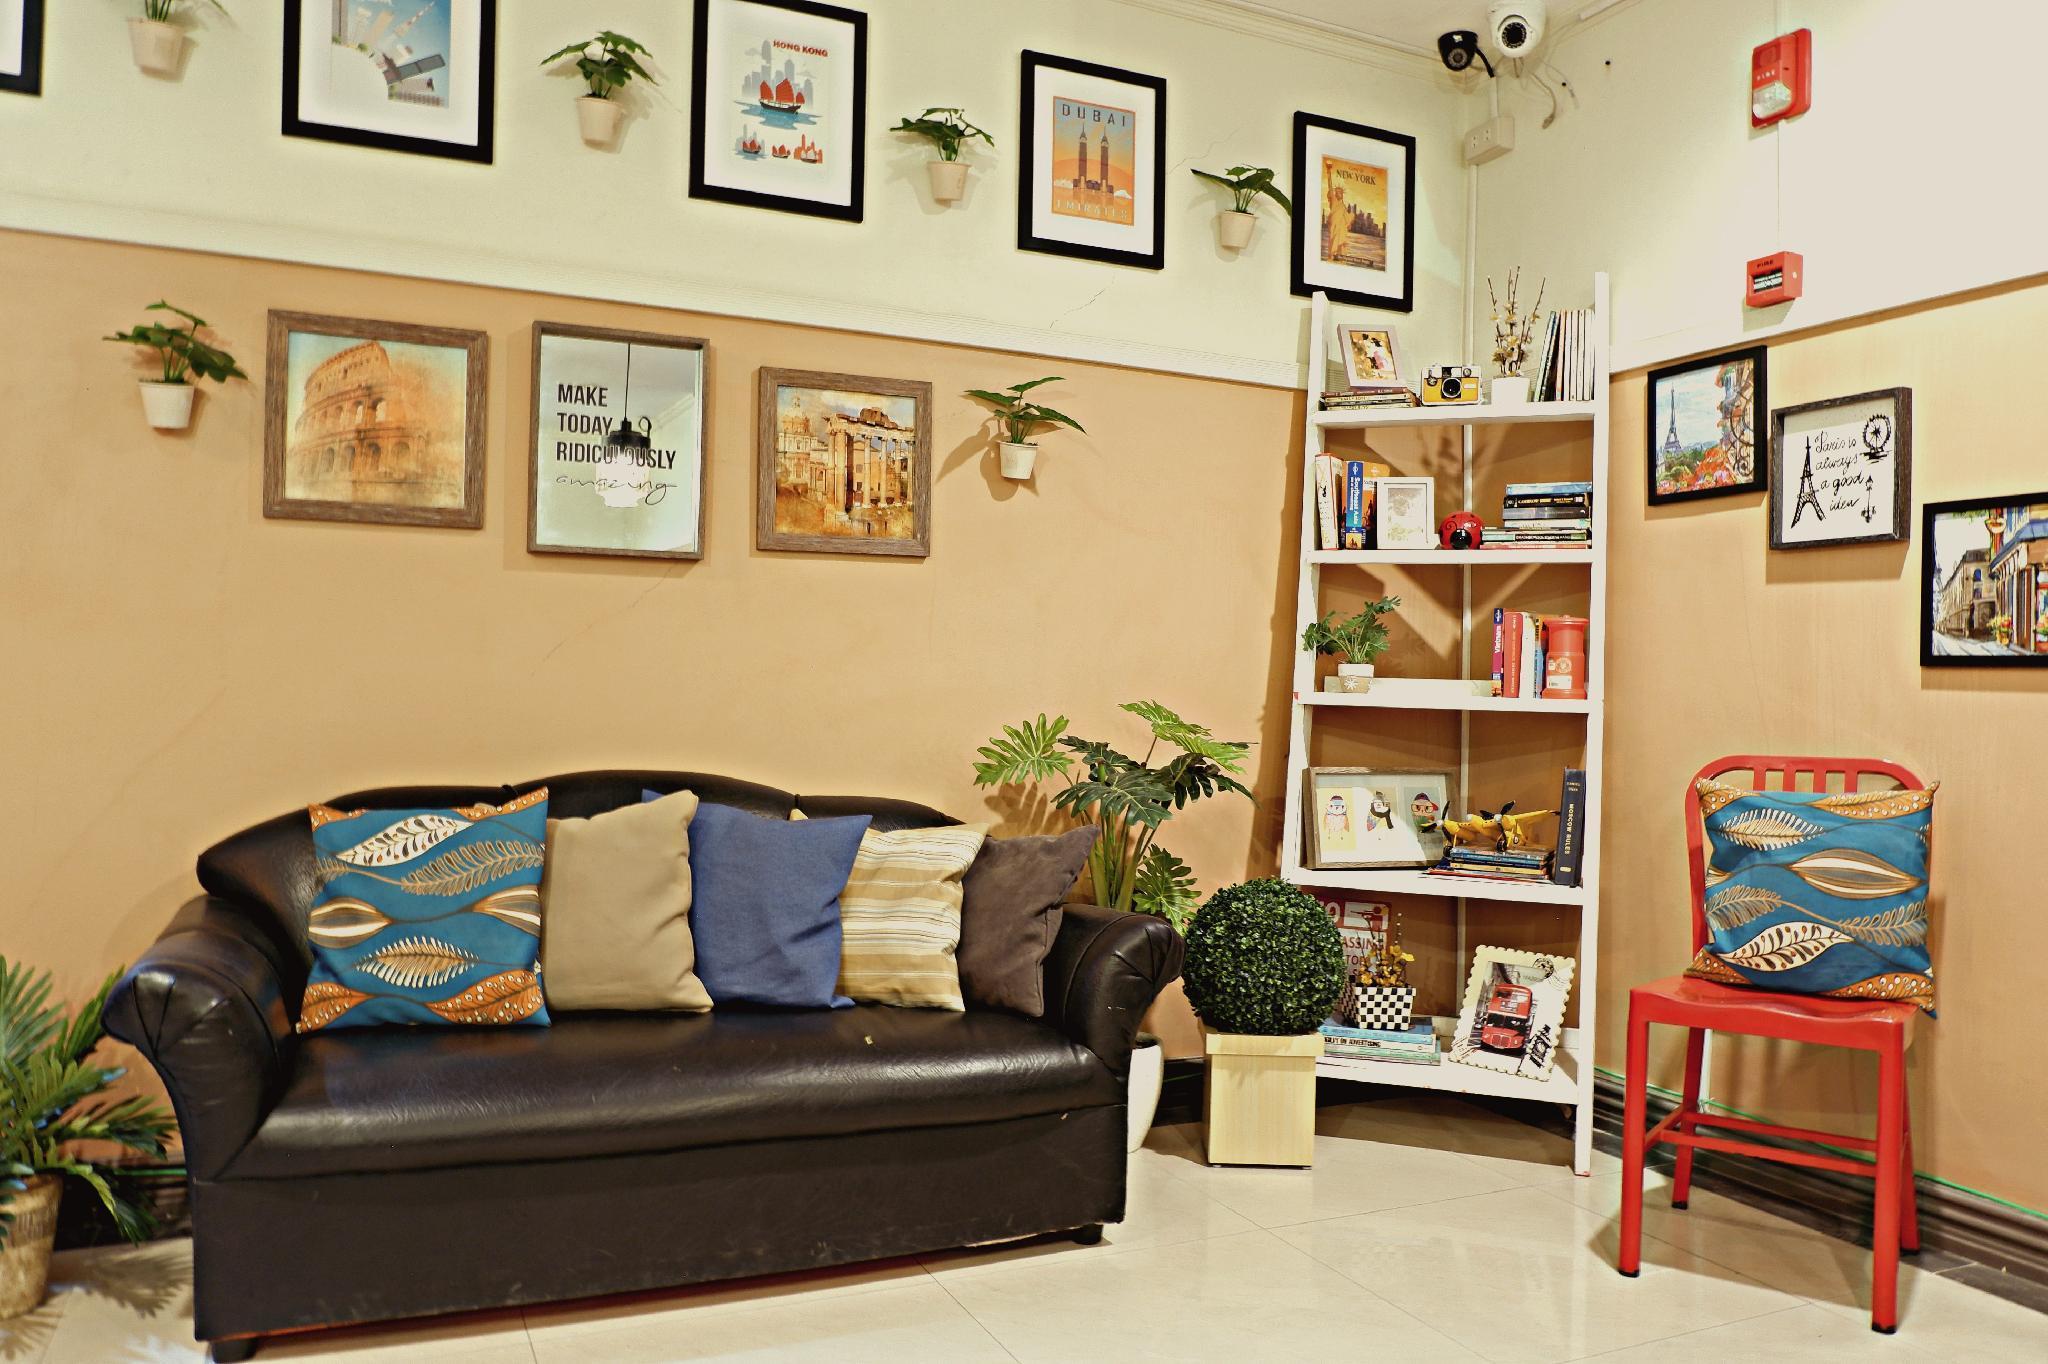 Best Price on Cebu Budgetel IT Park City Center in Cebu Reviews